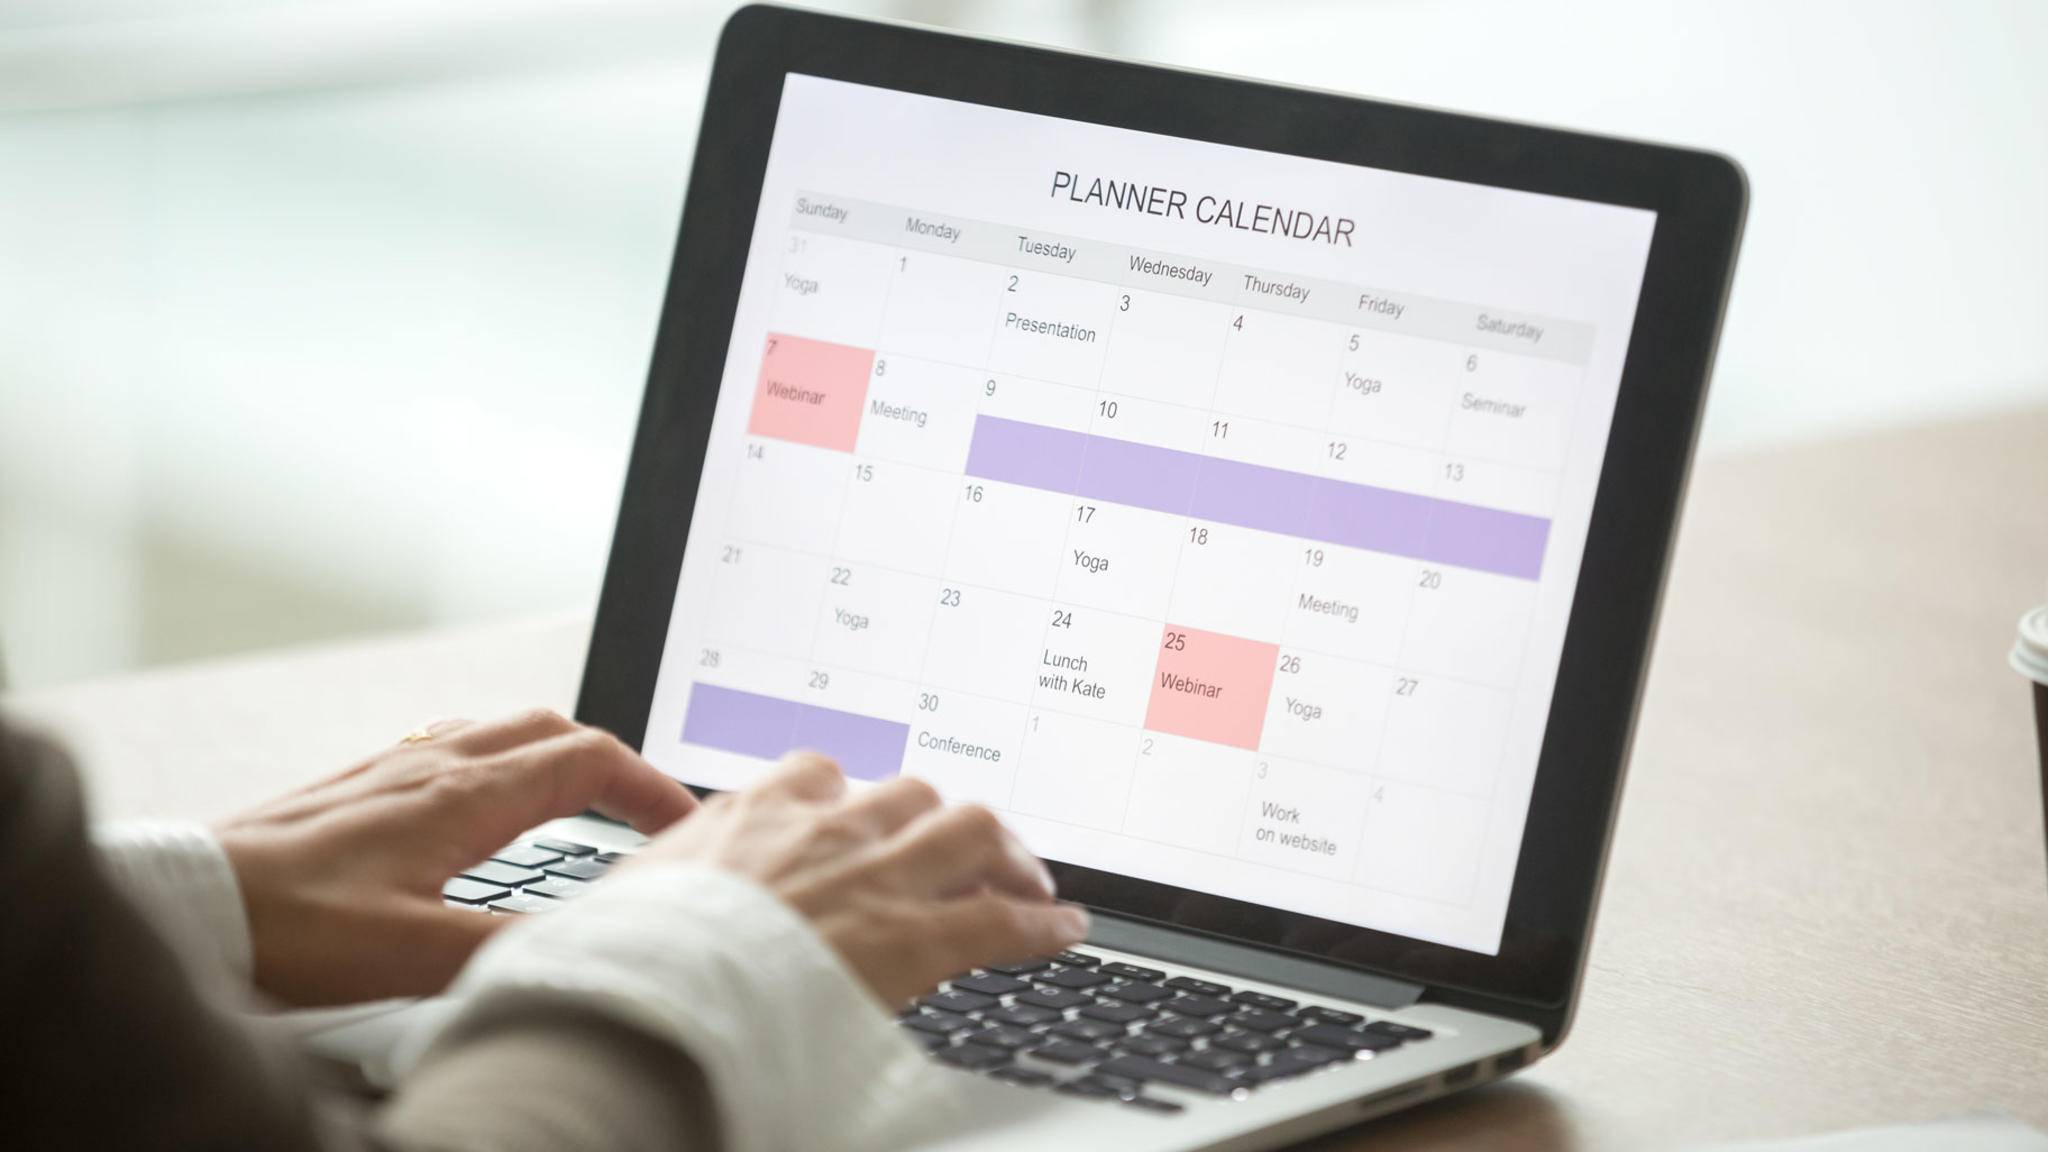 Wir verraten Dir, wie Du Deinen Outlook-Kalender im Handumdrehen teilen kannst.